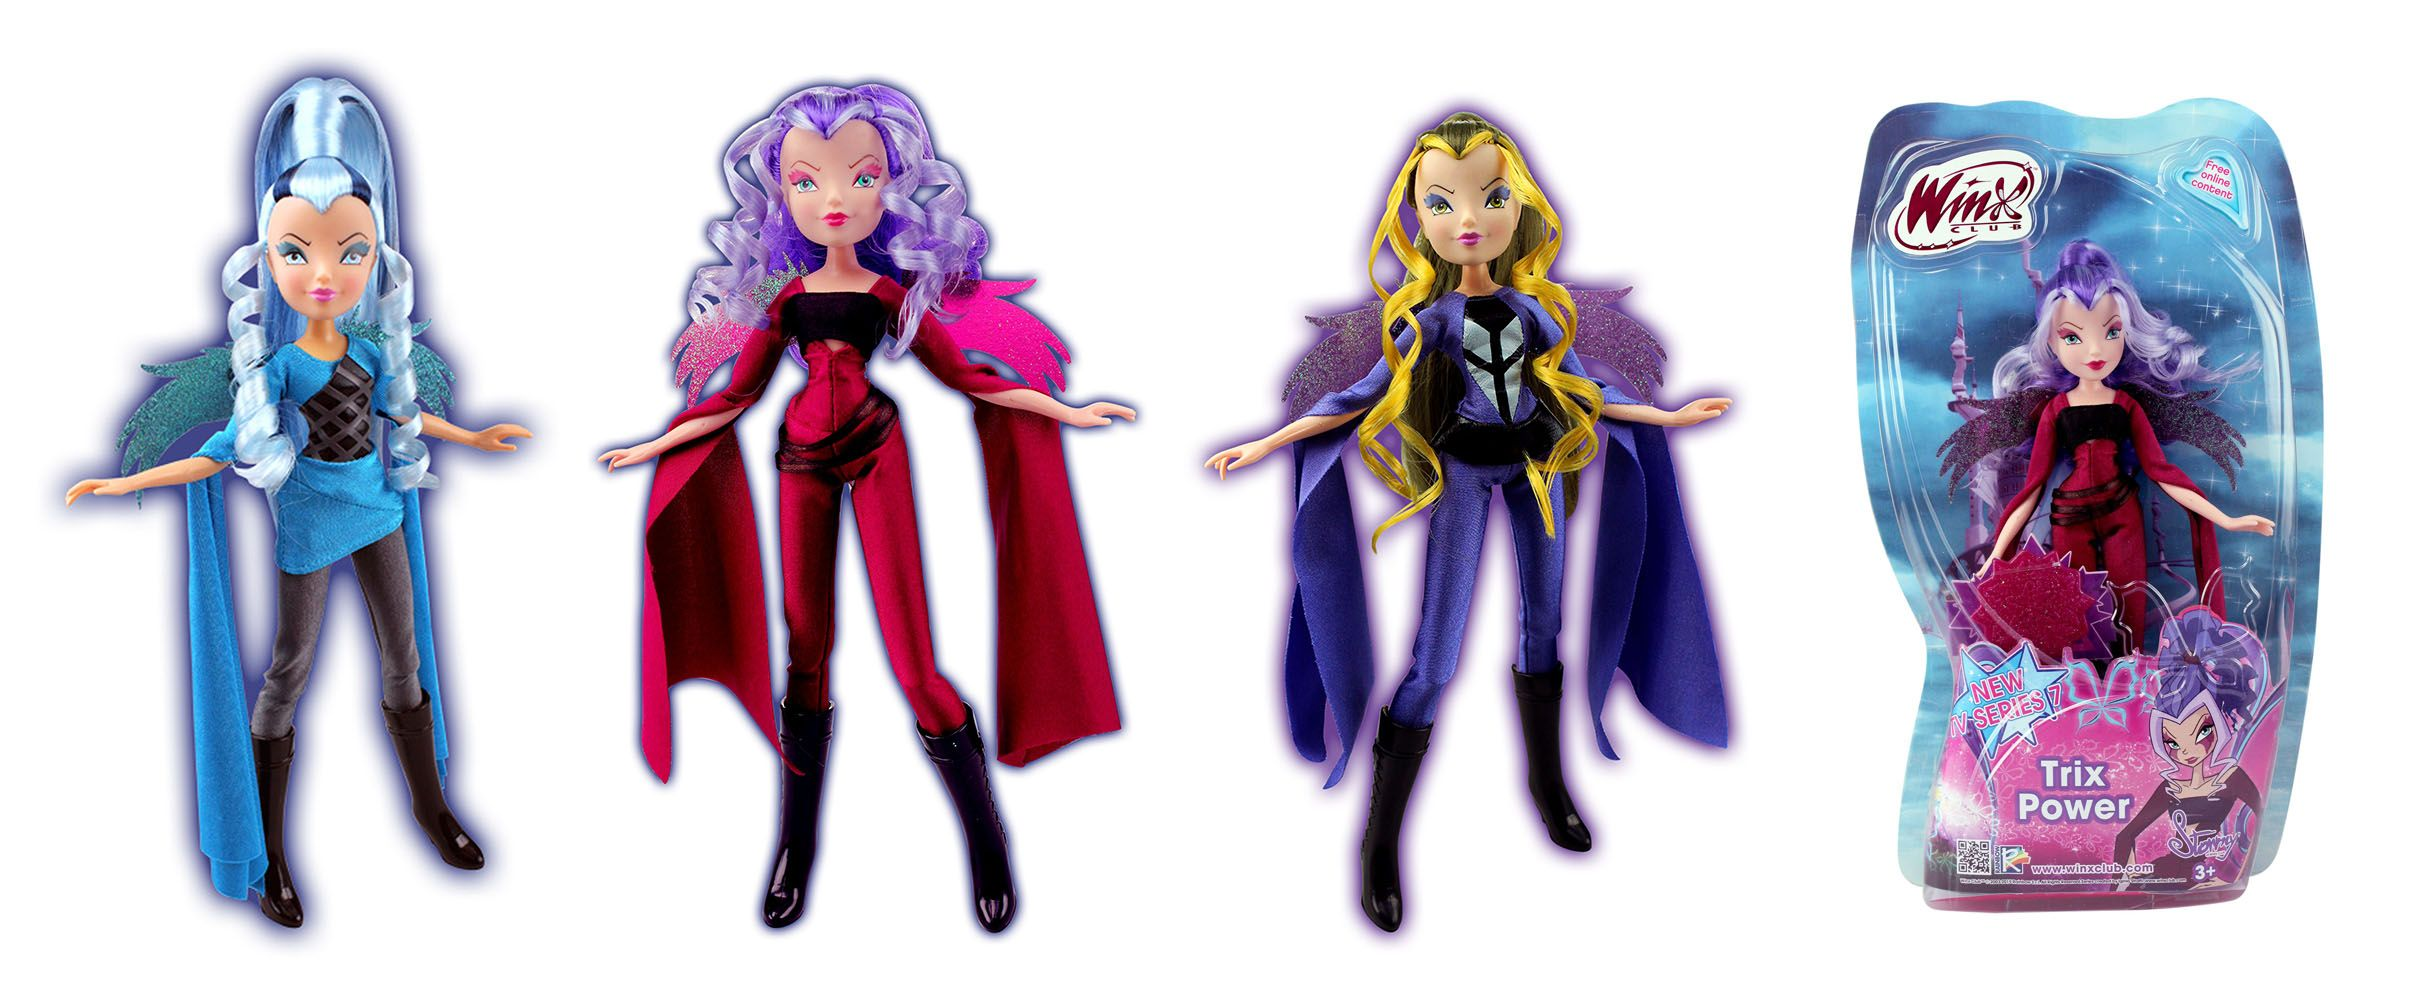 panenka Winx čarodějka/halloween) Trix Power